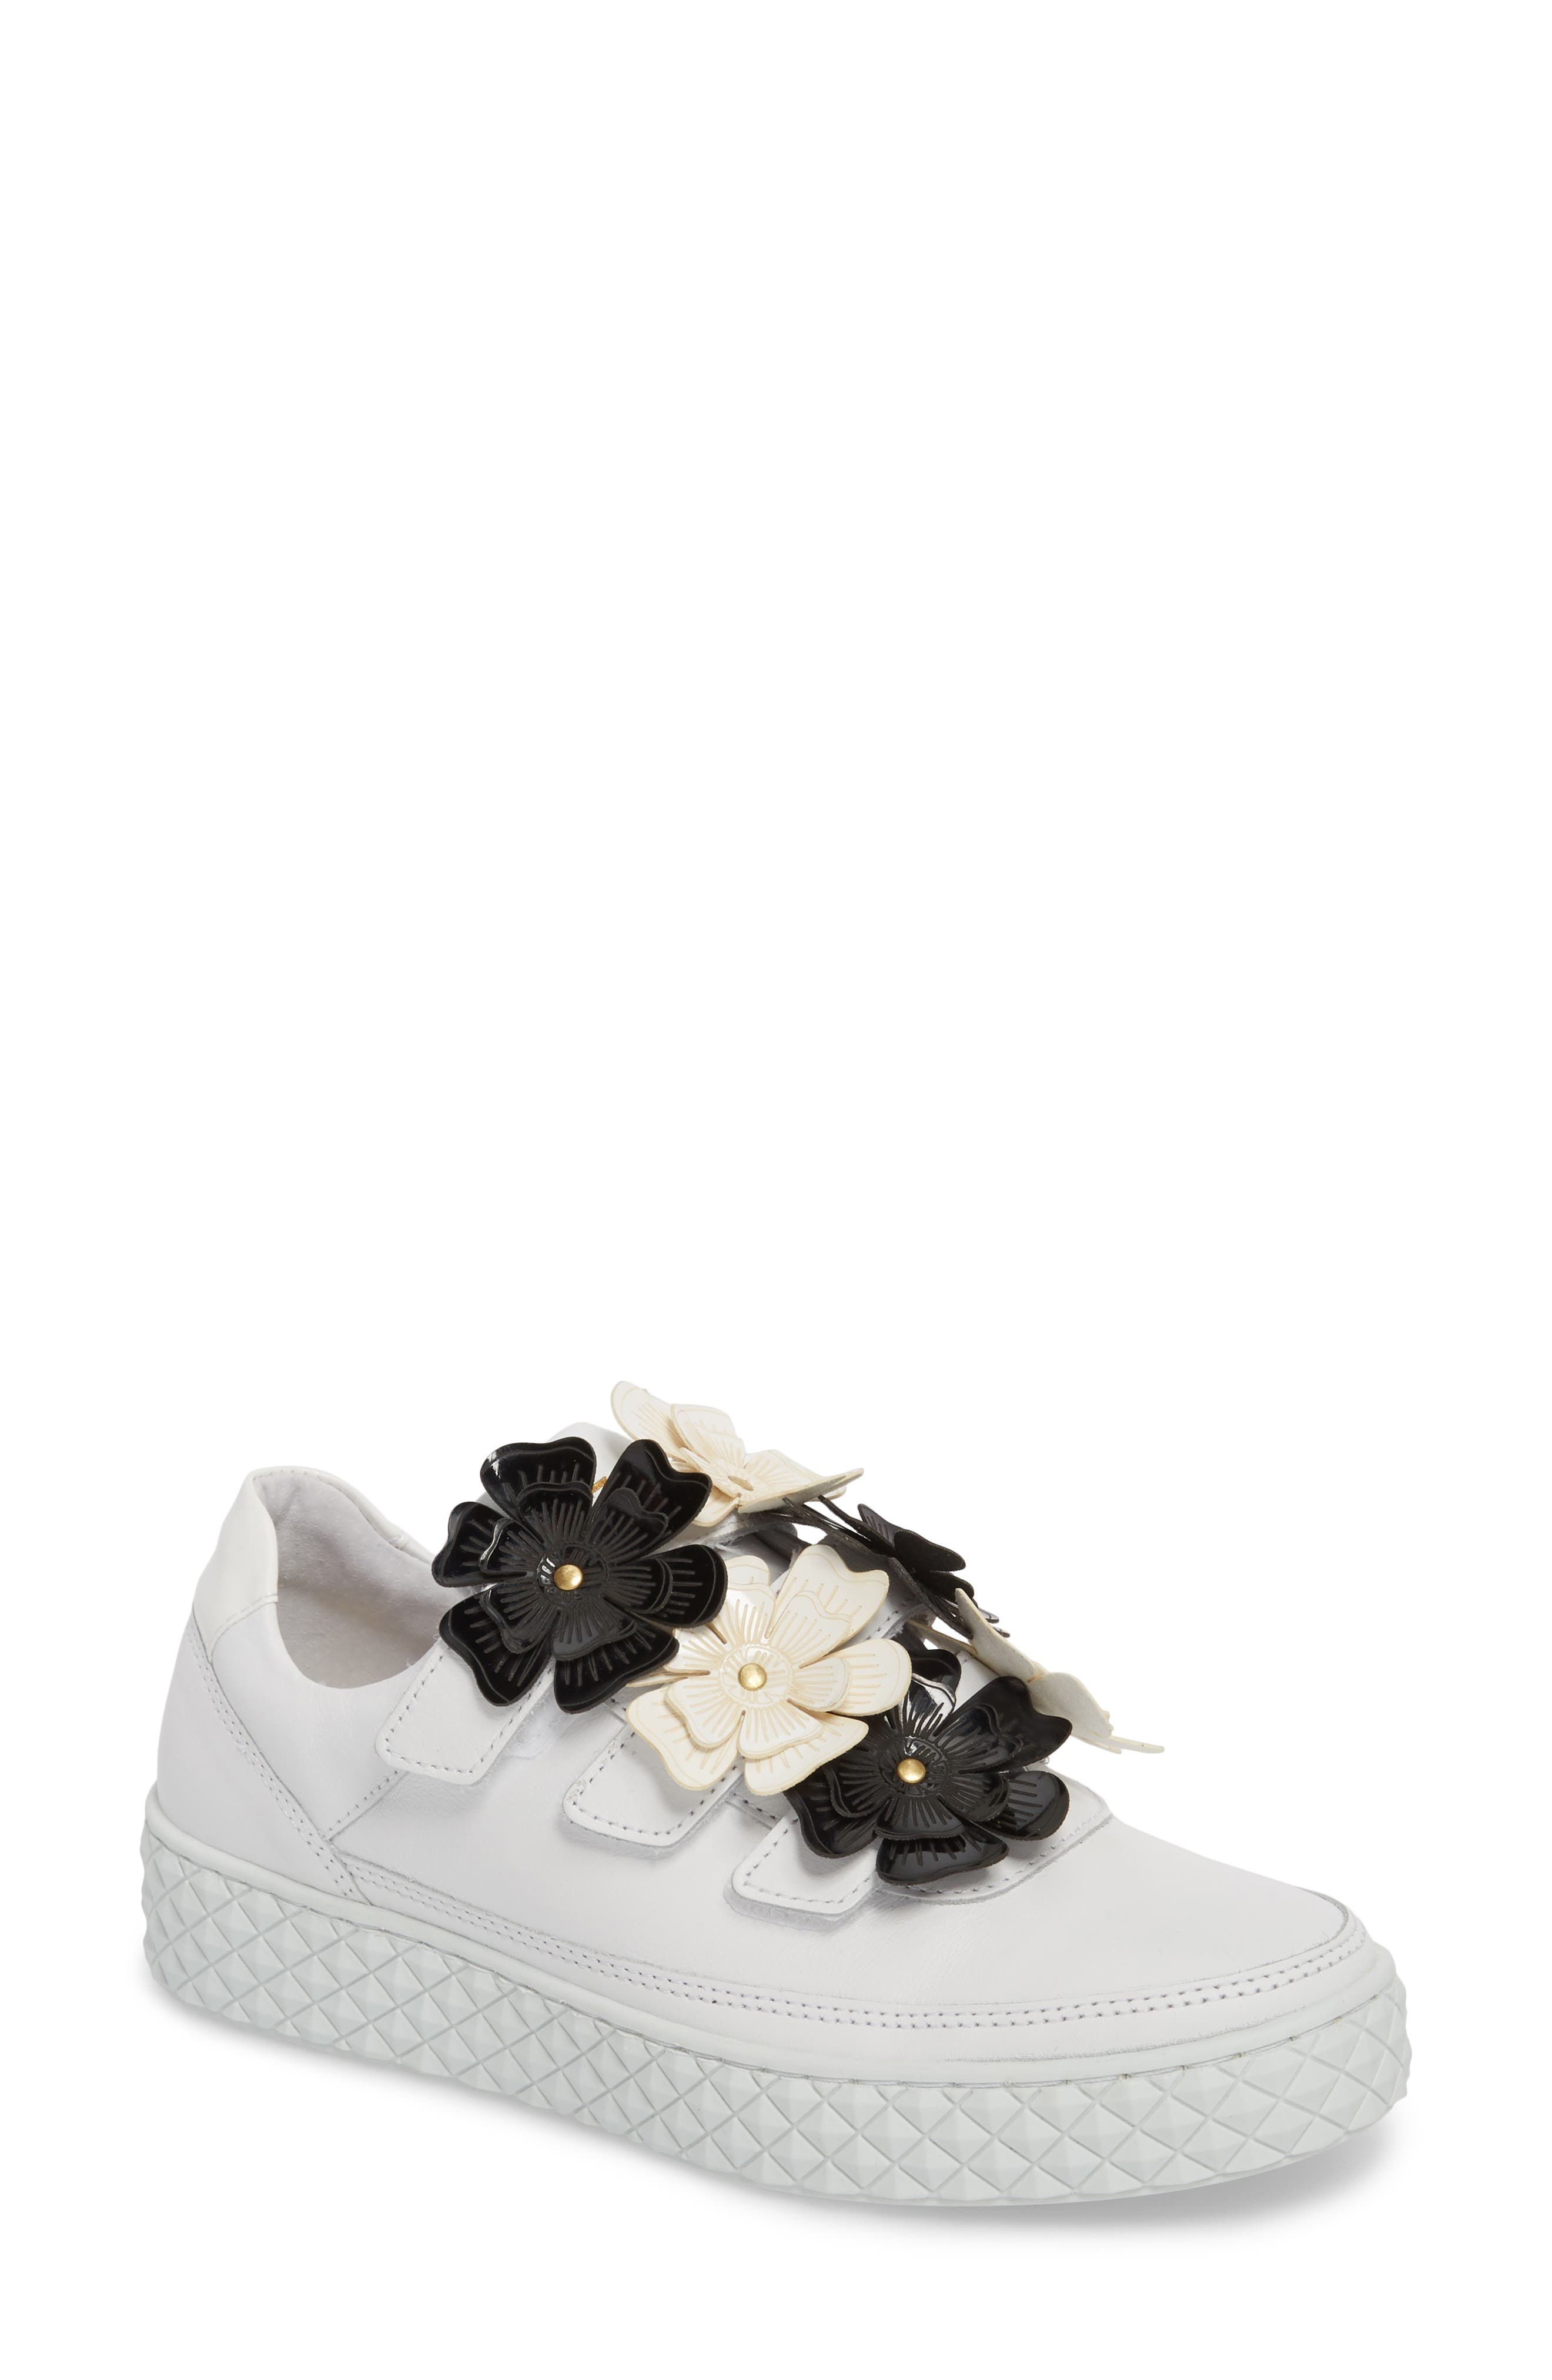 Hurou Embellished Sneaker,                         Main,                         color, Optic White/ Black Leather